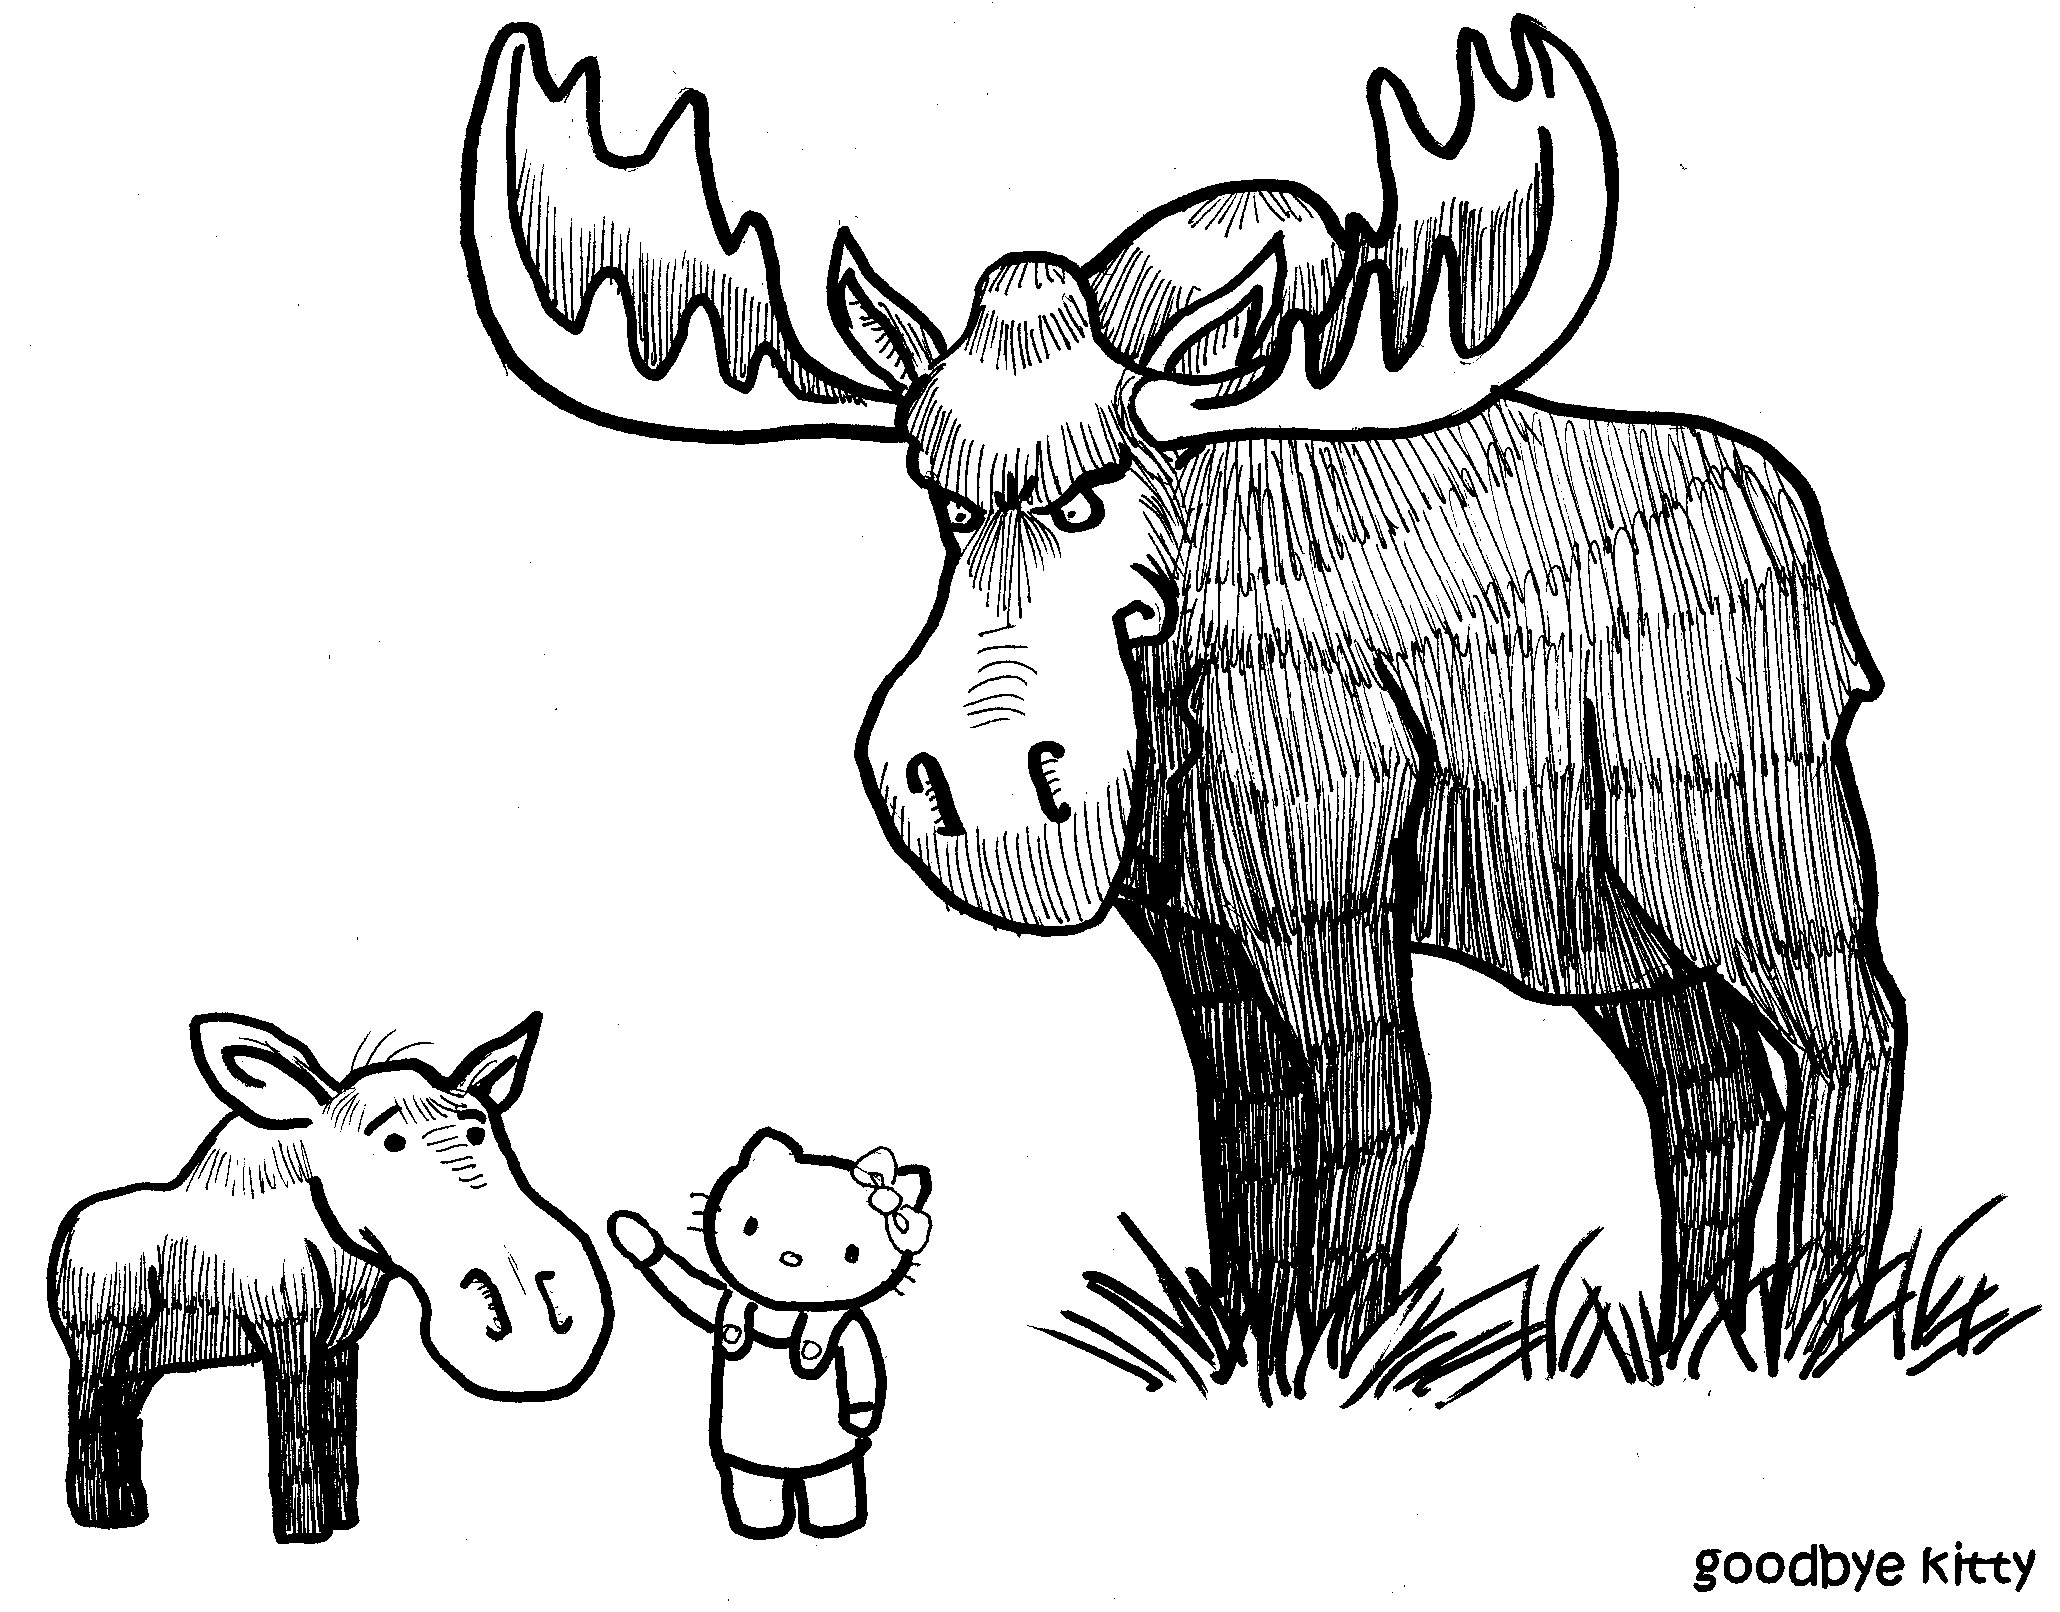 Enter The Moose (GBK#109)